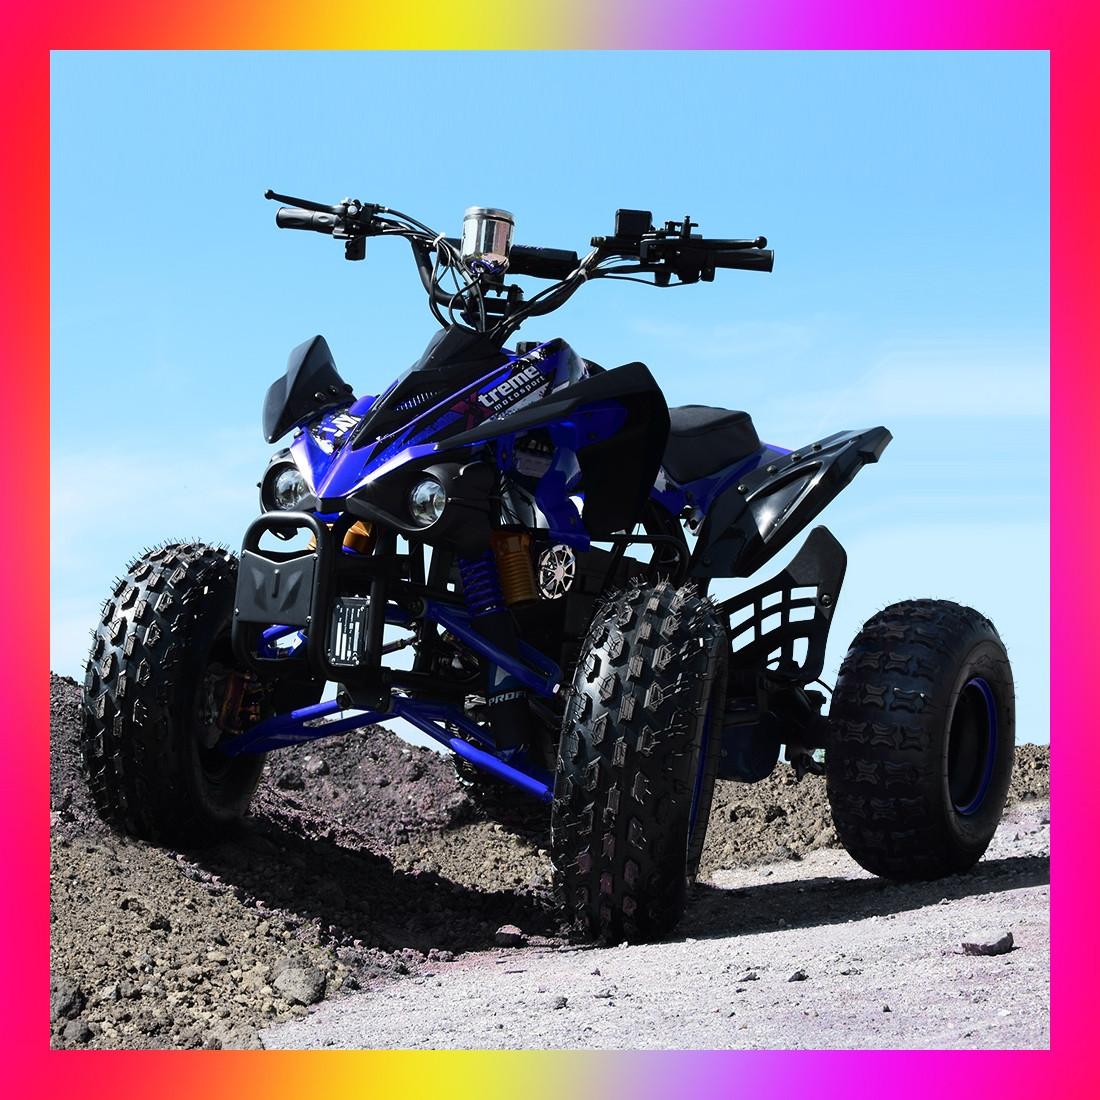 Квадроцикл электрический с мотором 1000W Profi HB-EATV1000Q2-7 (MP3) синий для детей от 8 лет